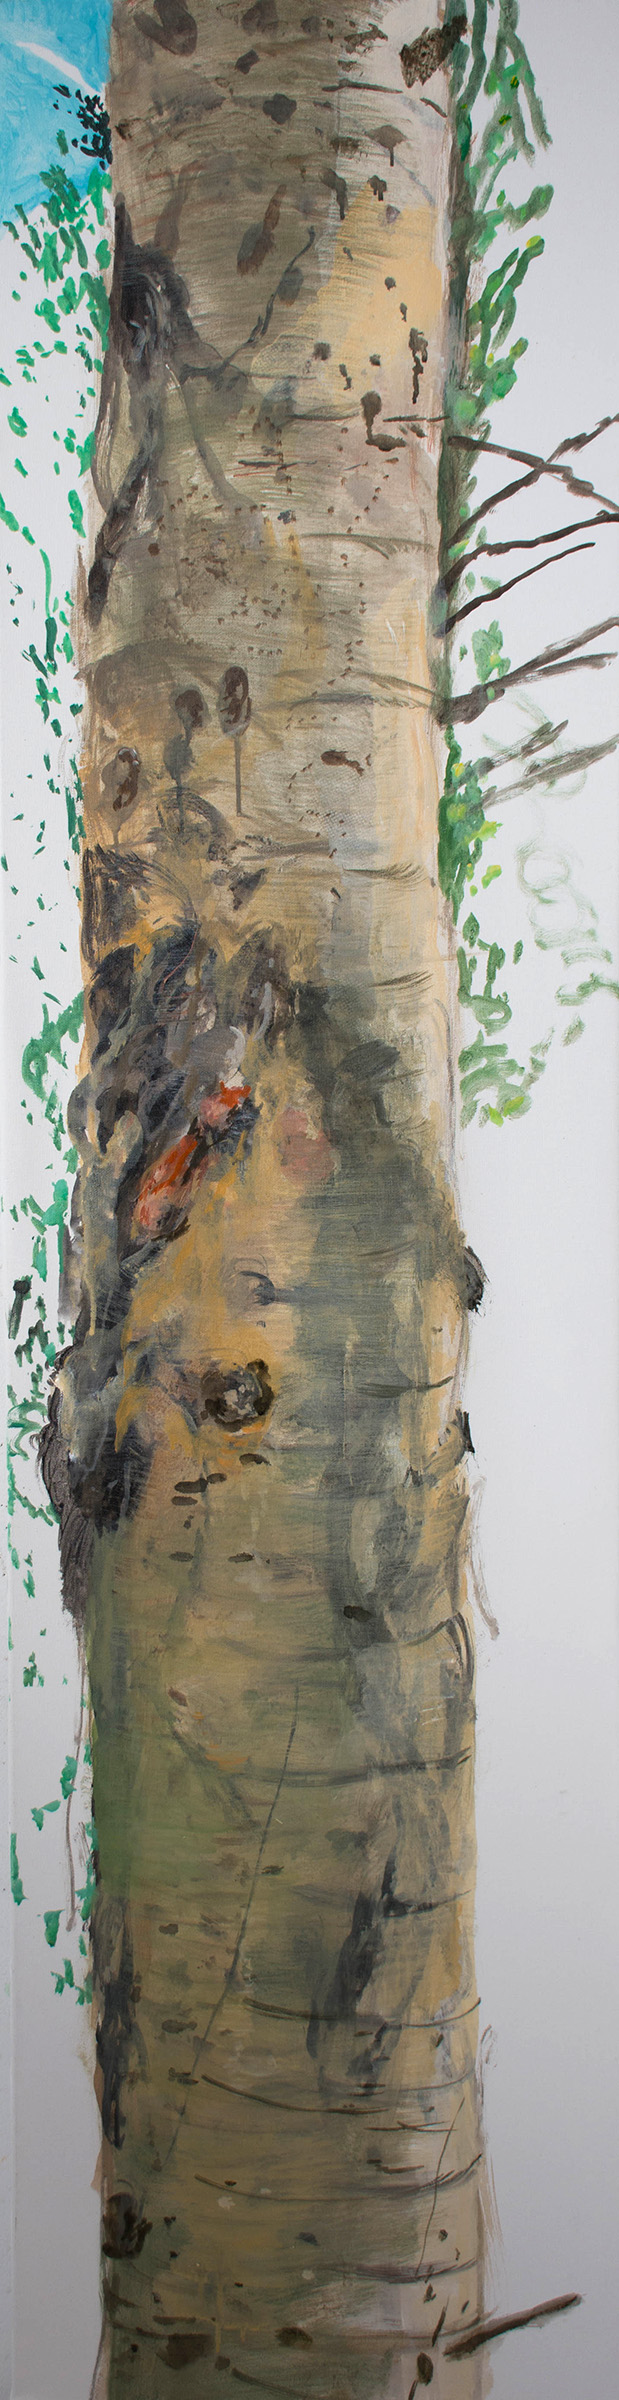 SITE-10-31-17 tree 2 4-30.jpg